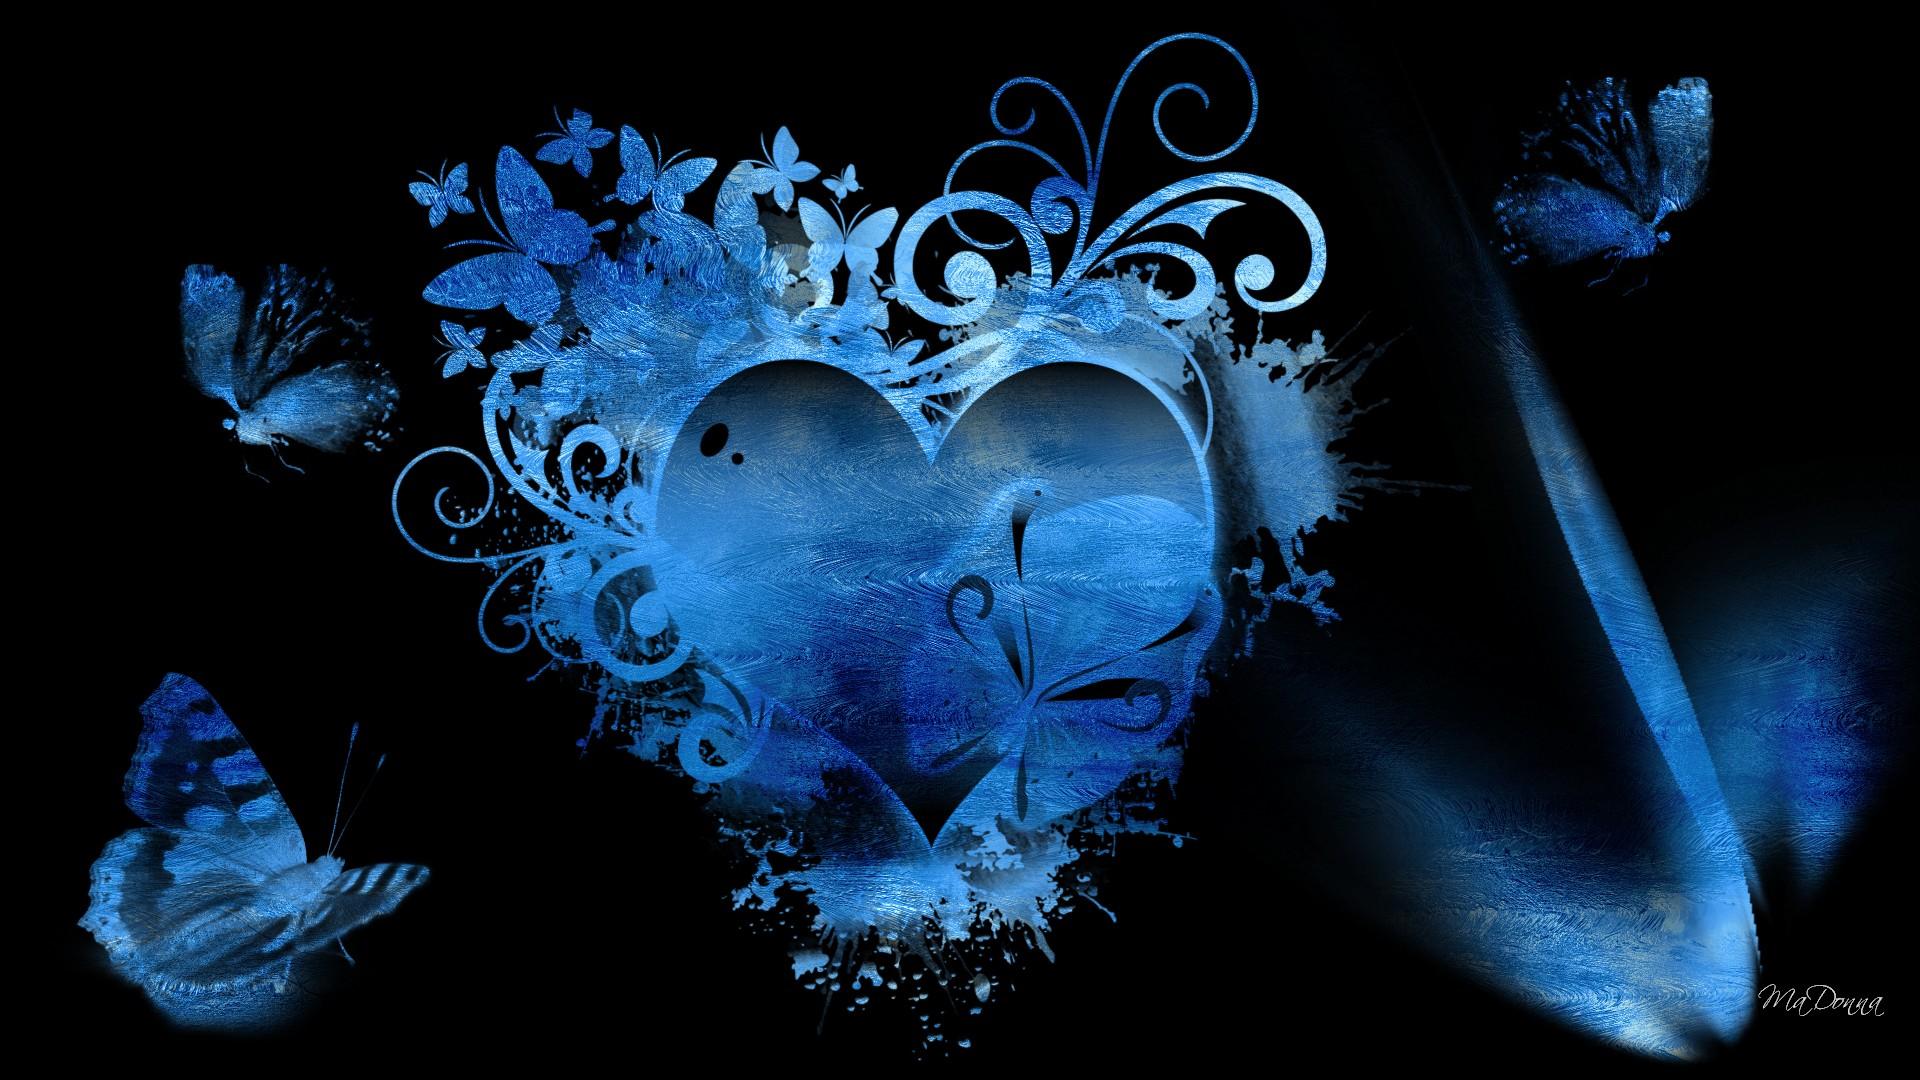 Blue Hearts Background Wallpaper - WallpaperSafari